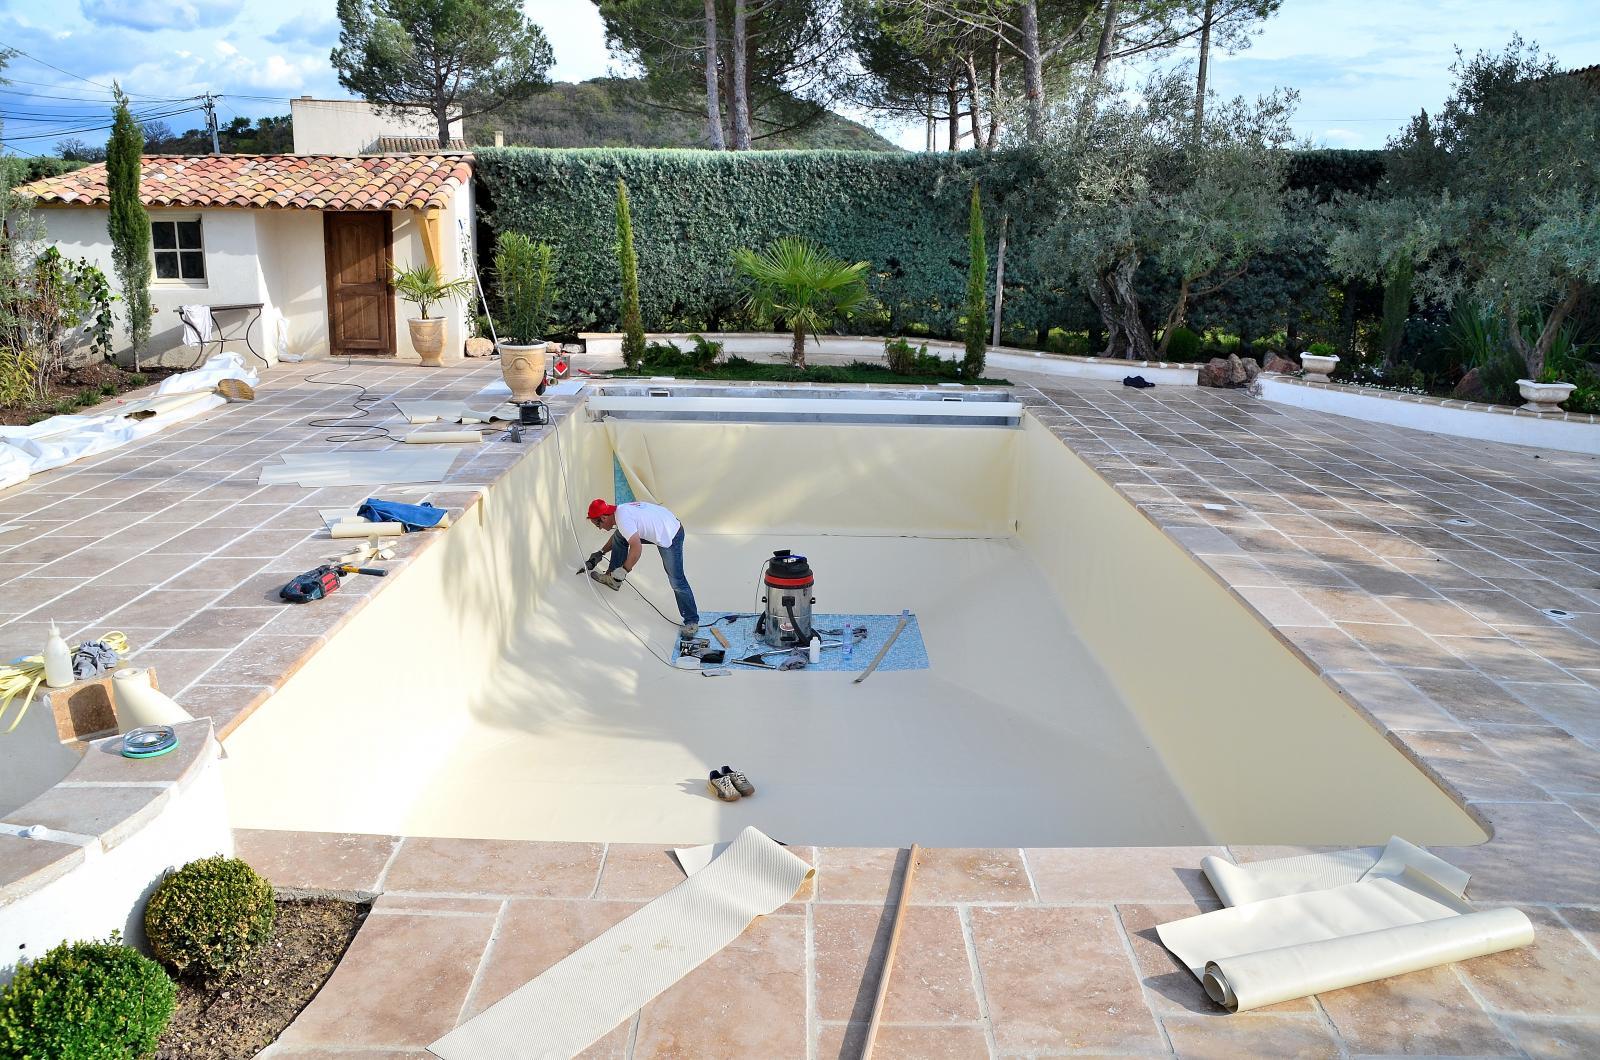 Aquapro : Installation Et Matériel De Piscine Manosque 04100 ... concernant Cash Piscine Manosque